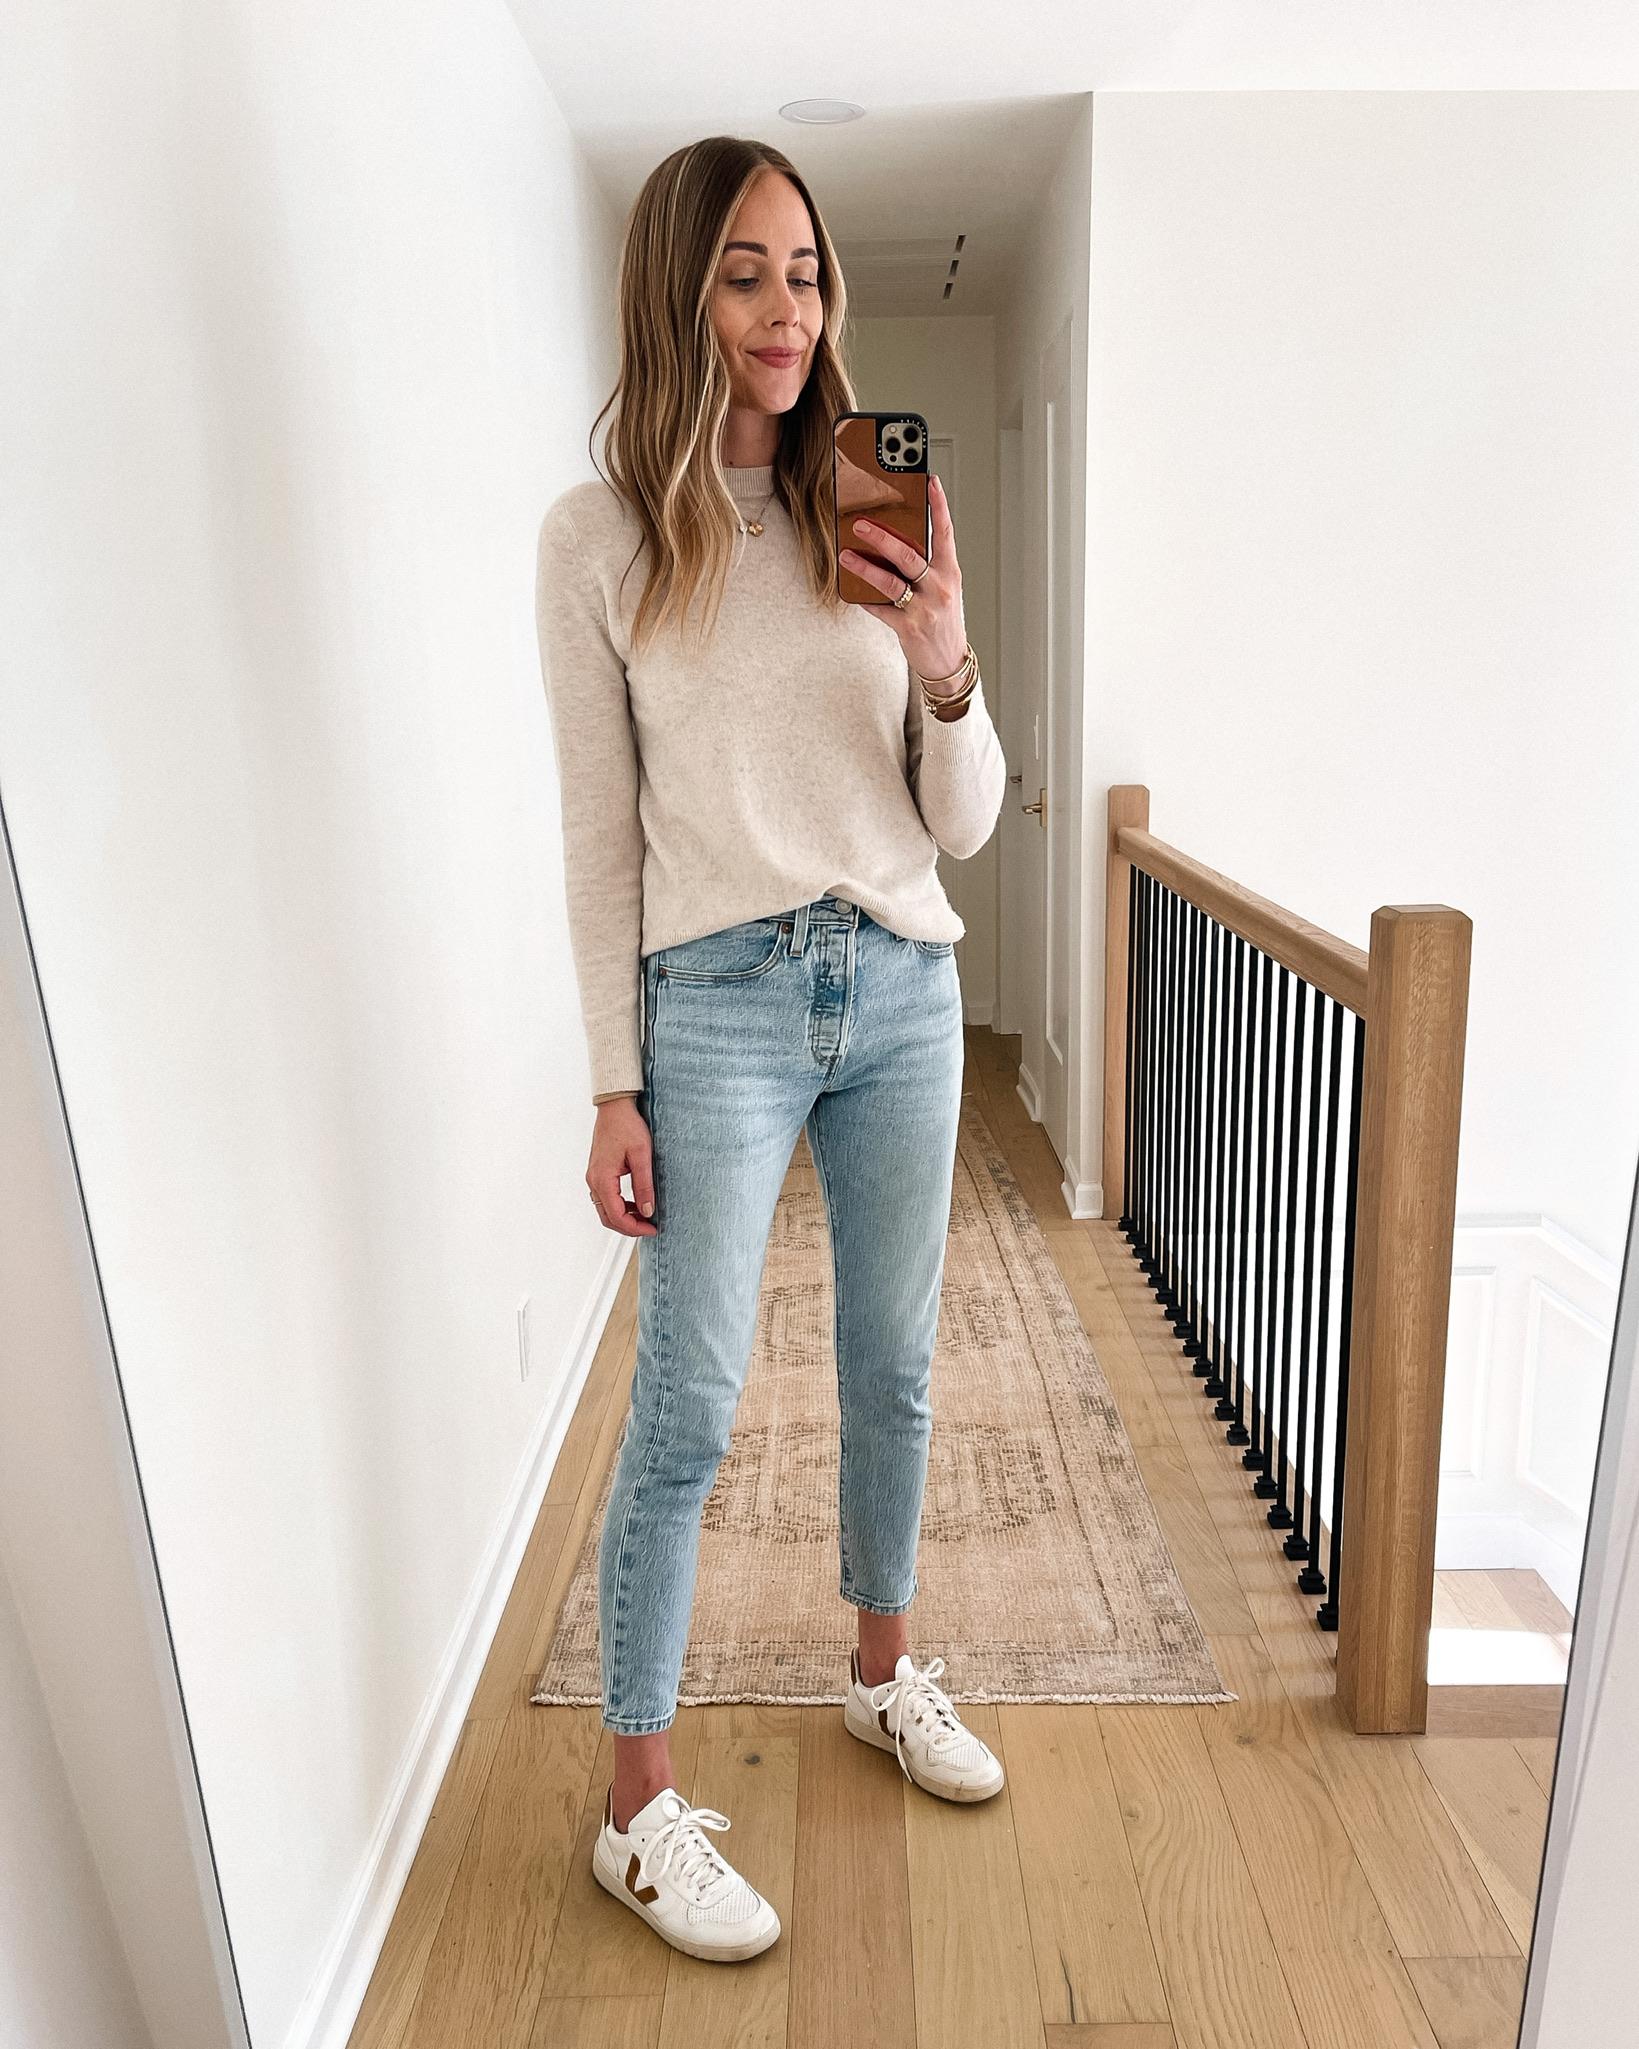 Fashion Jackson Wearing Vince Beige Sweater Levis 501 Skinny Jeans Veja V10 sneakers